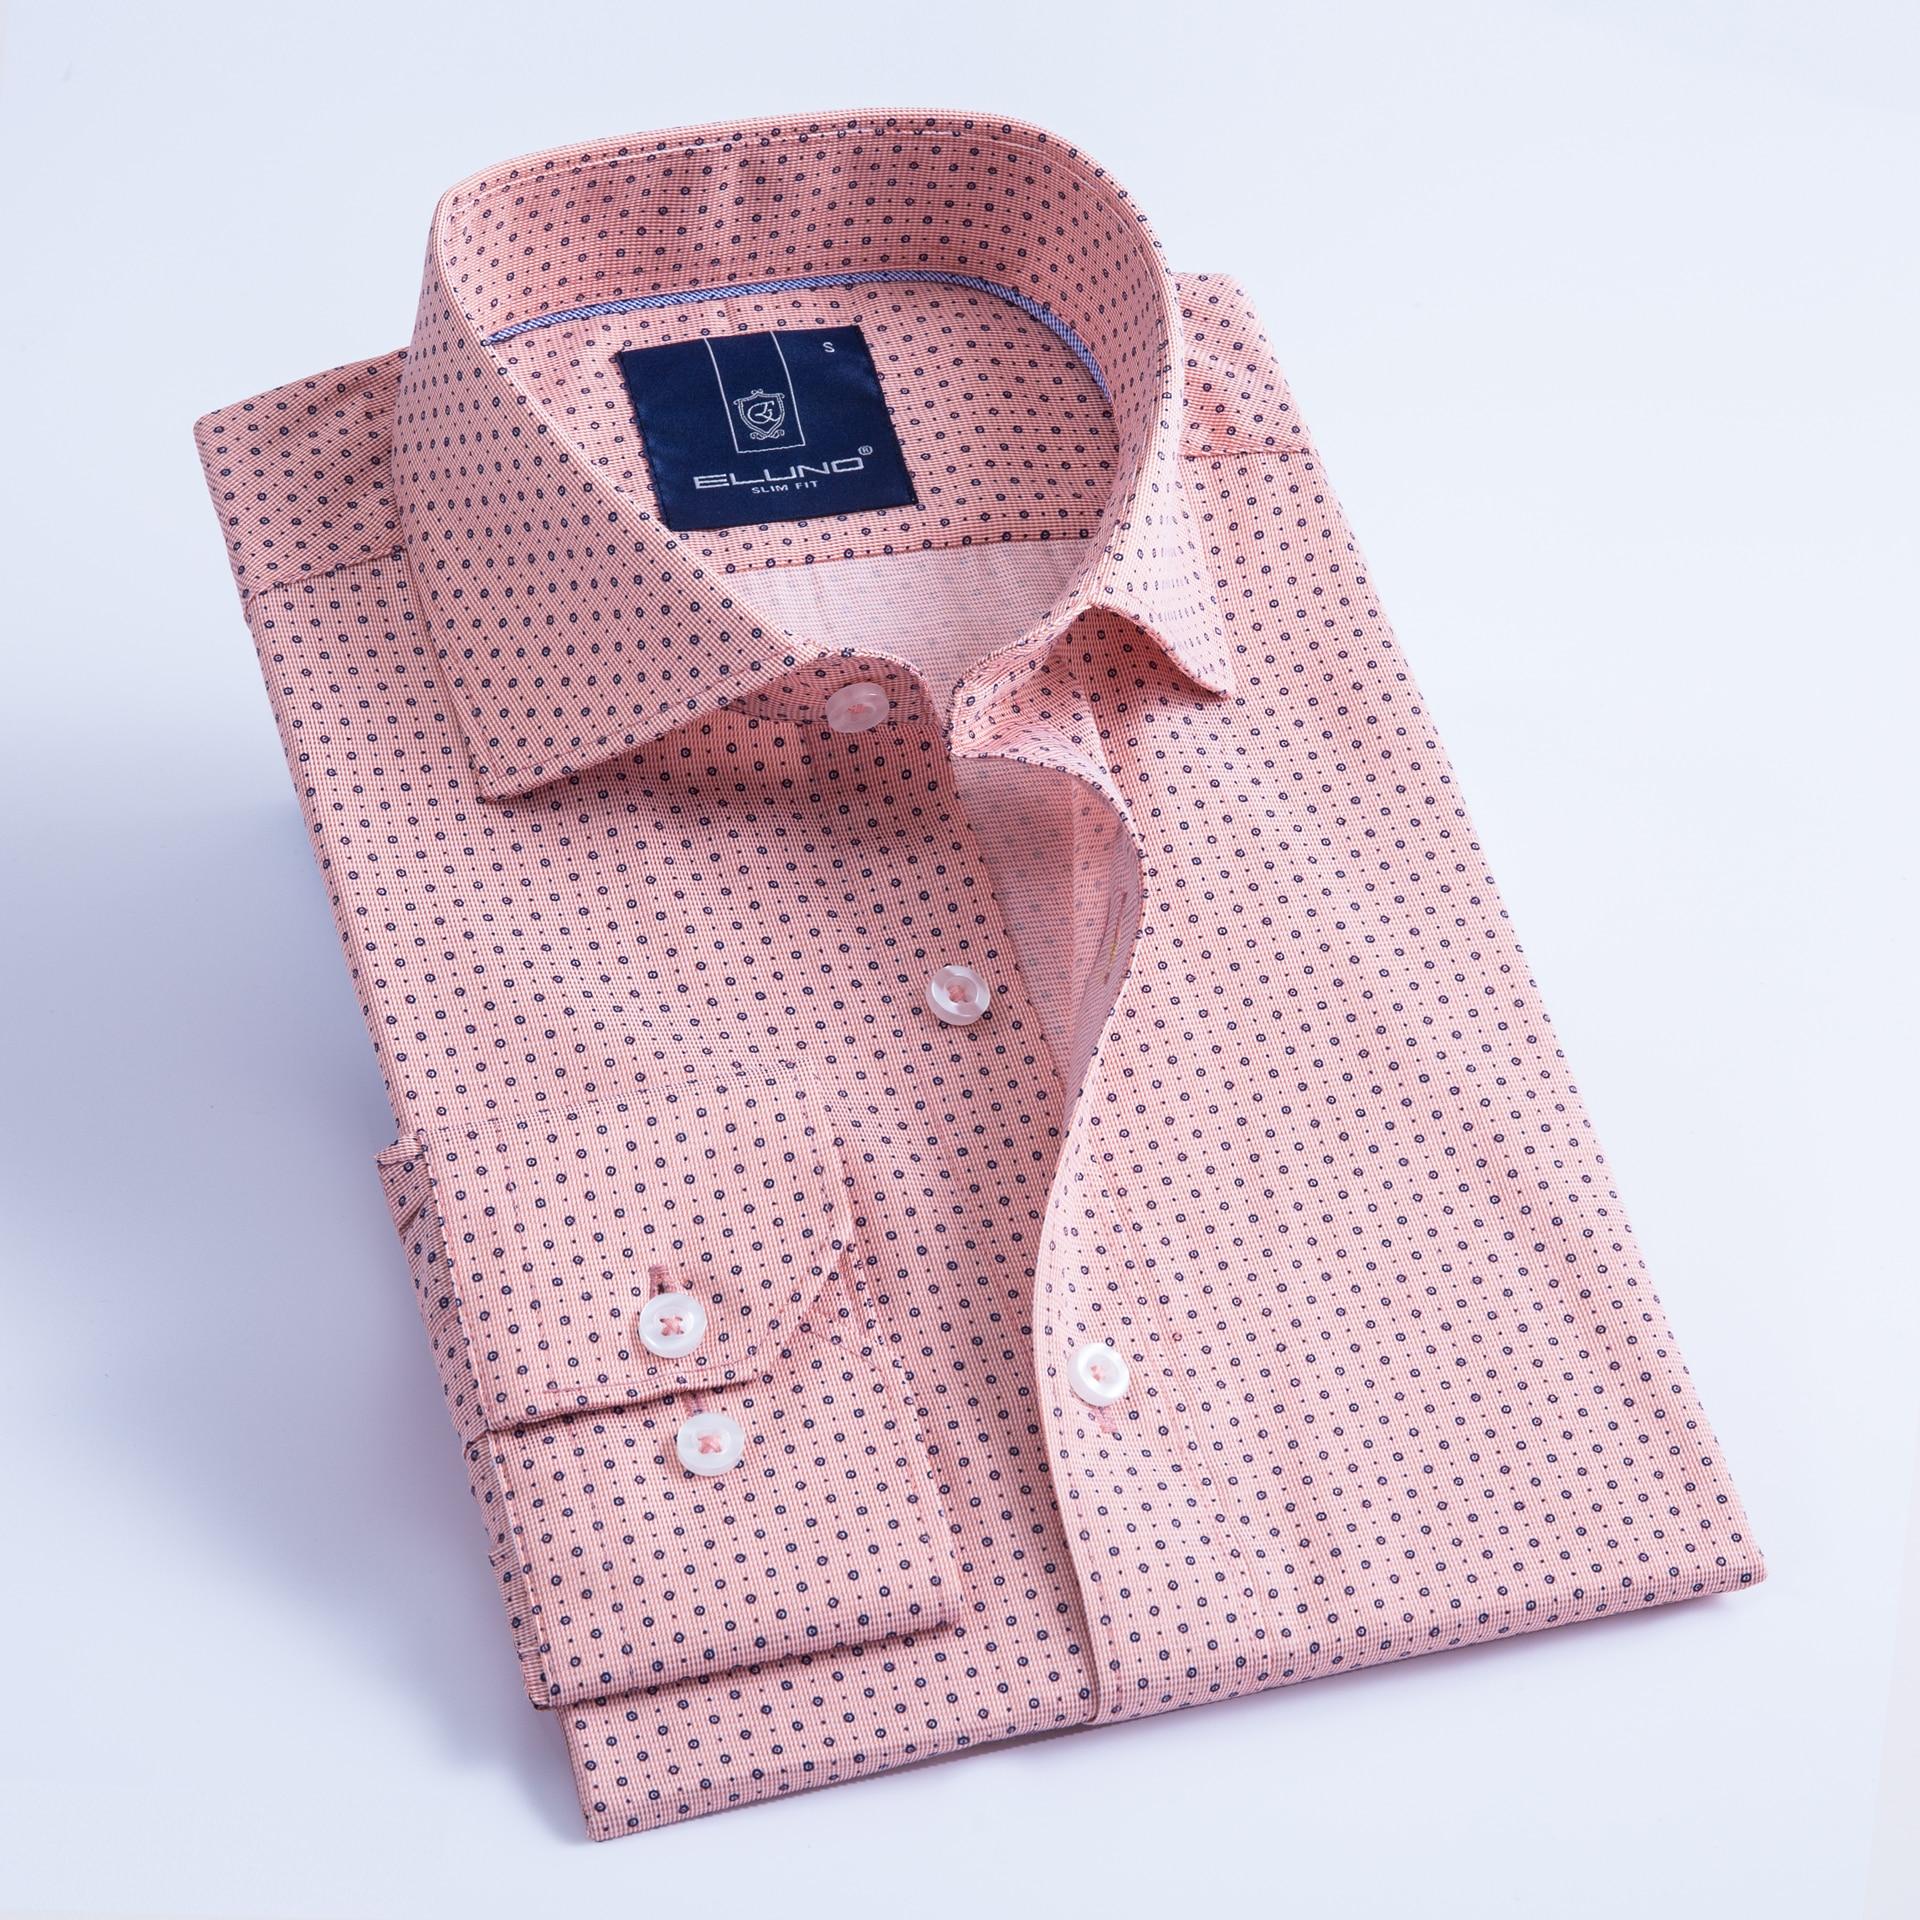 ELUNO Fashion Casual Long Sleeved Printed Shirt Slim Fit Male Social Business Dress Shirt Brand Men Clothing Soft Comfortable